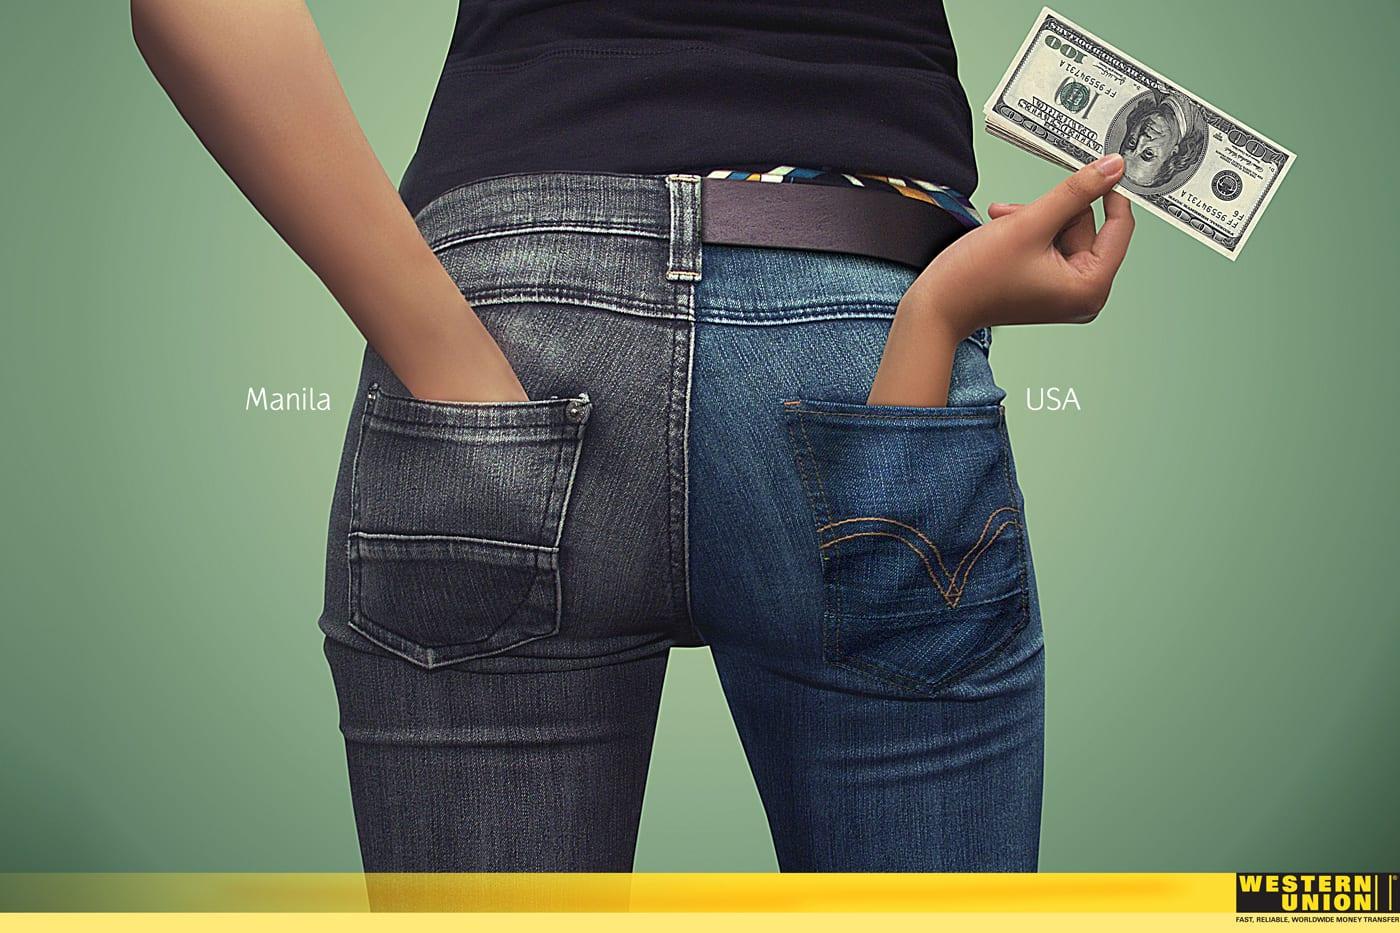 Best Money Transfer Service Providers - Western Union